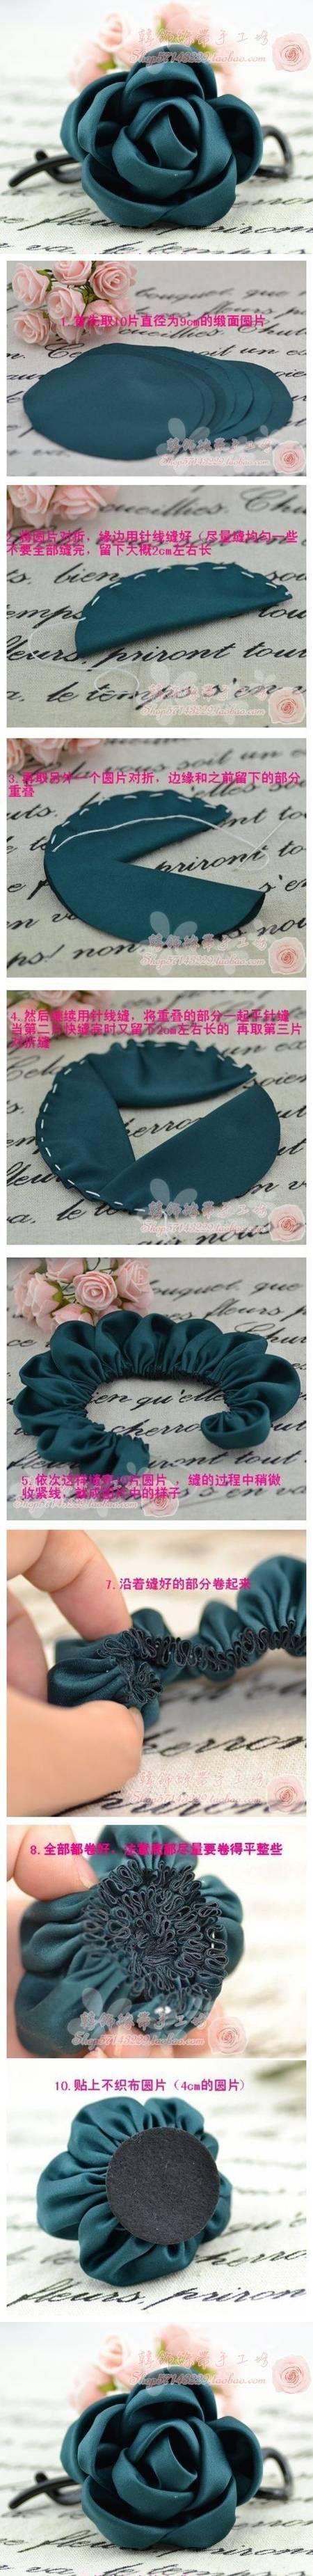 DIY Easy Fabric Roses | crafts